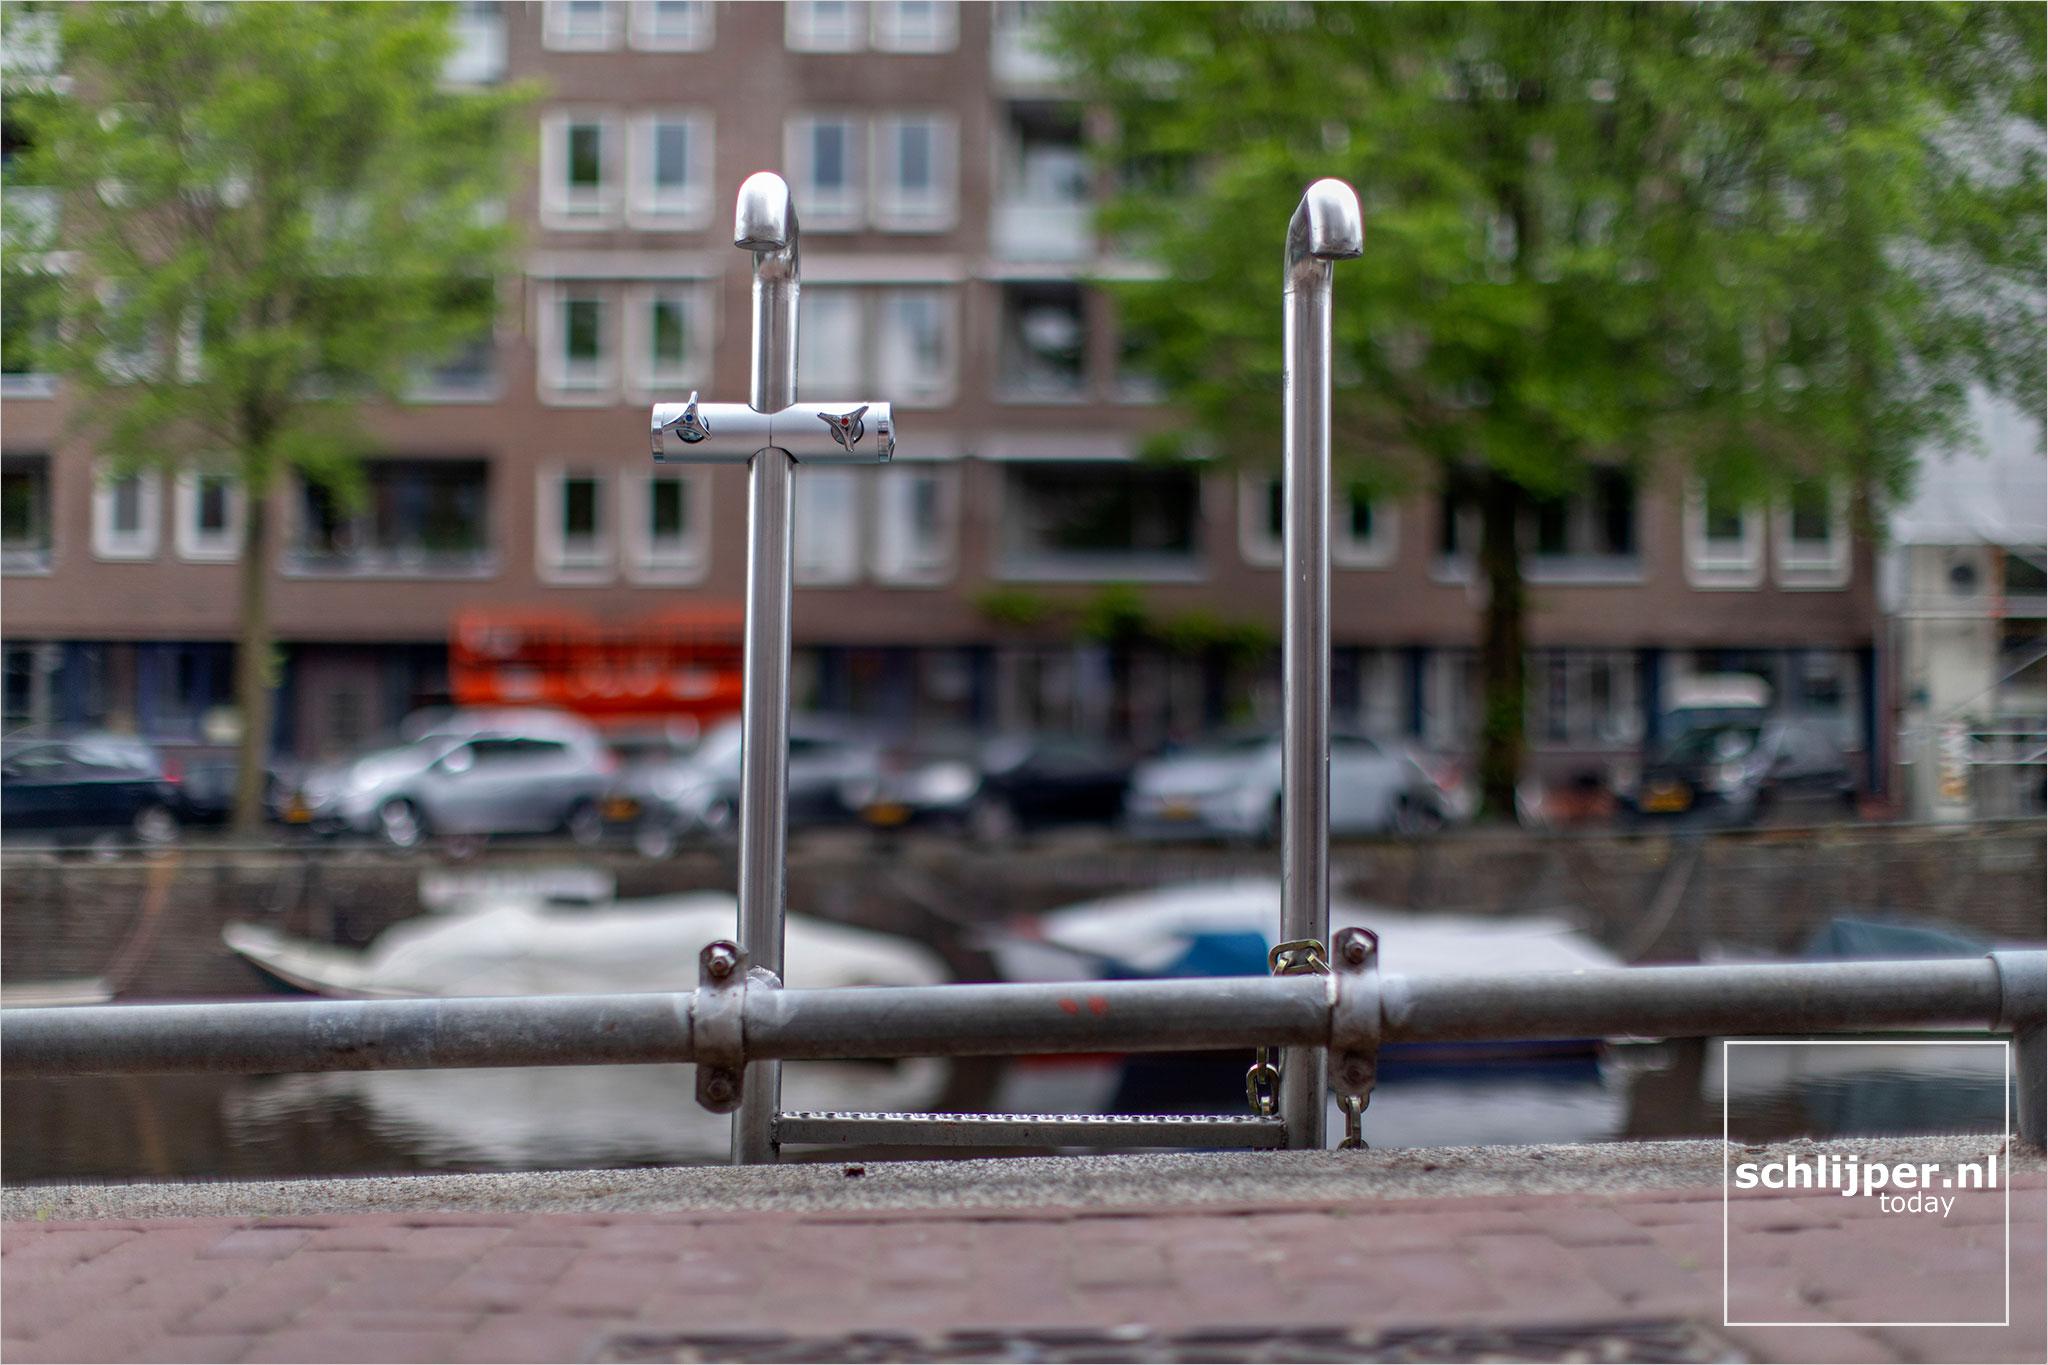 Nederland, Amsterdam, 16 mei 2020